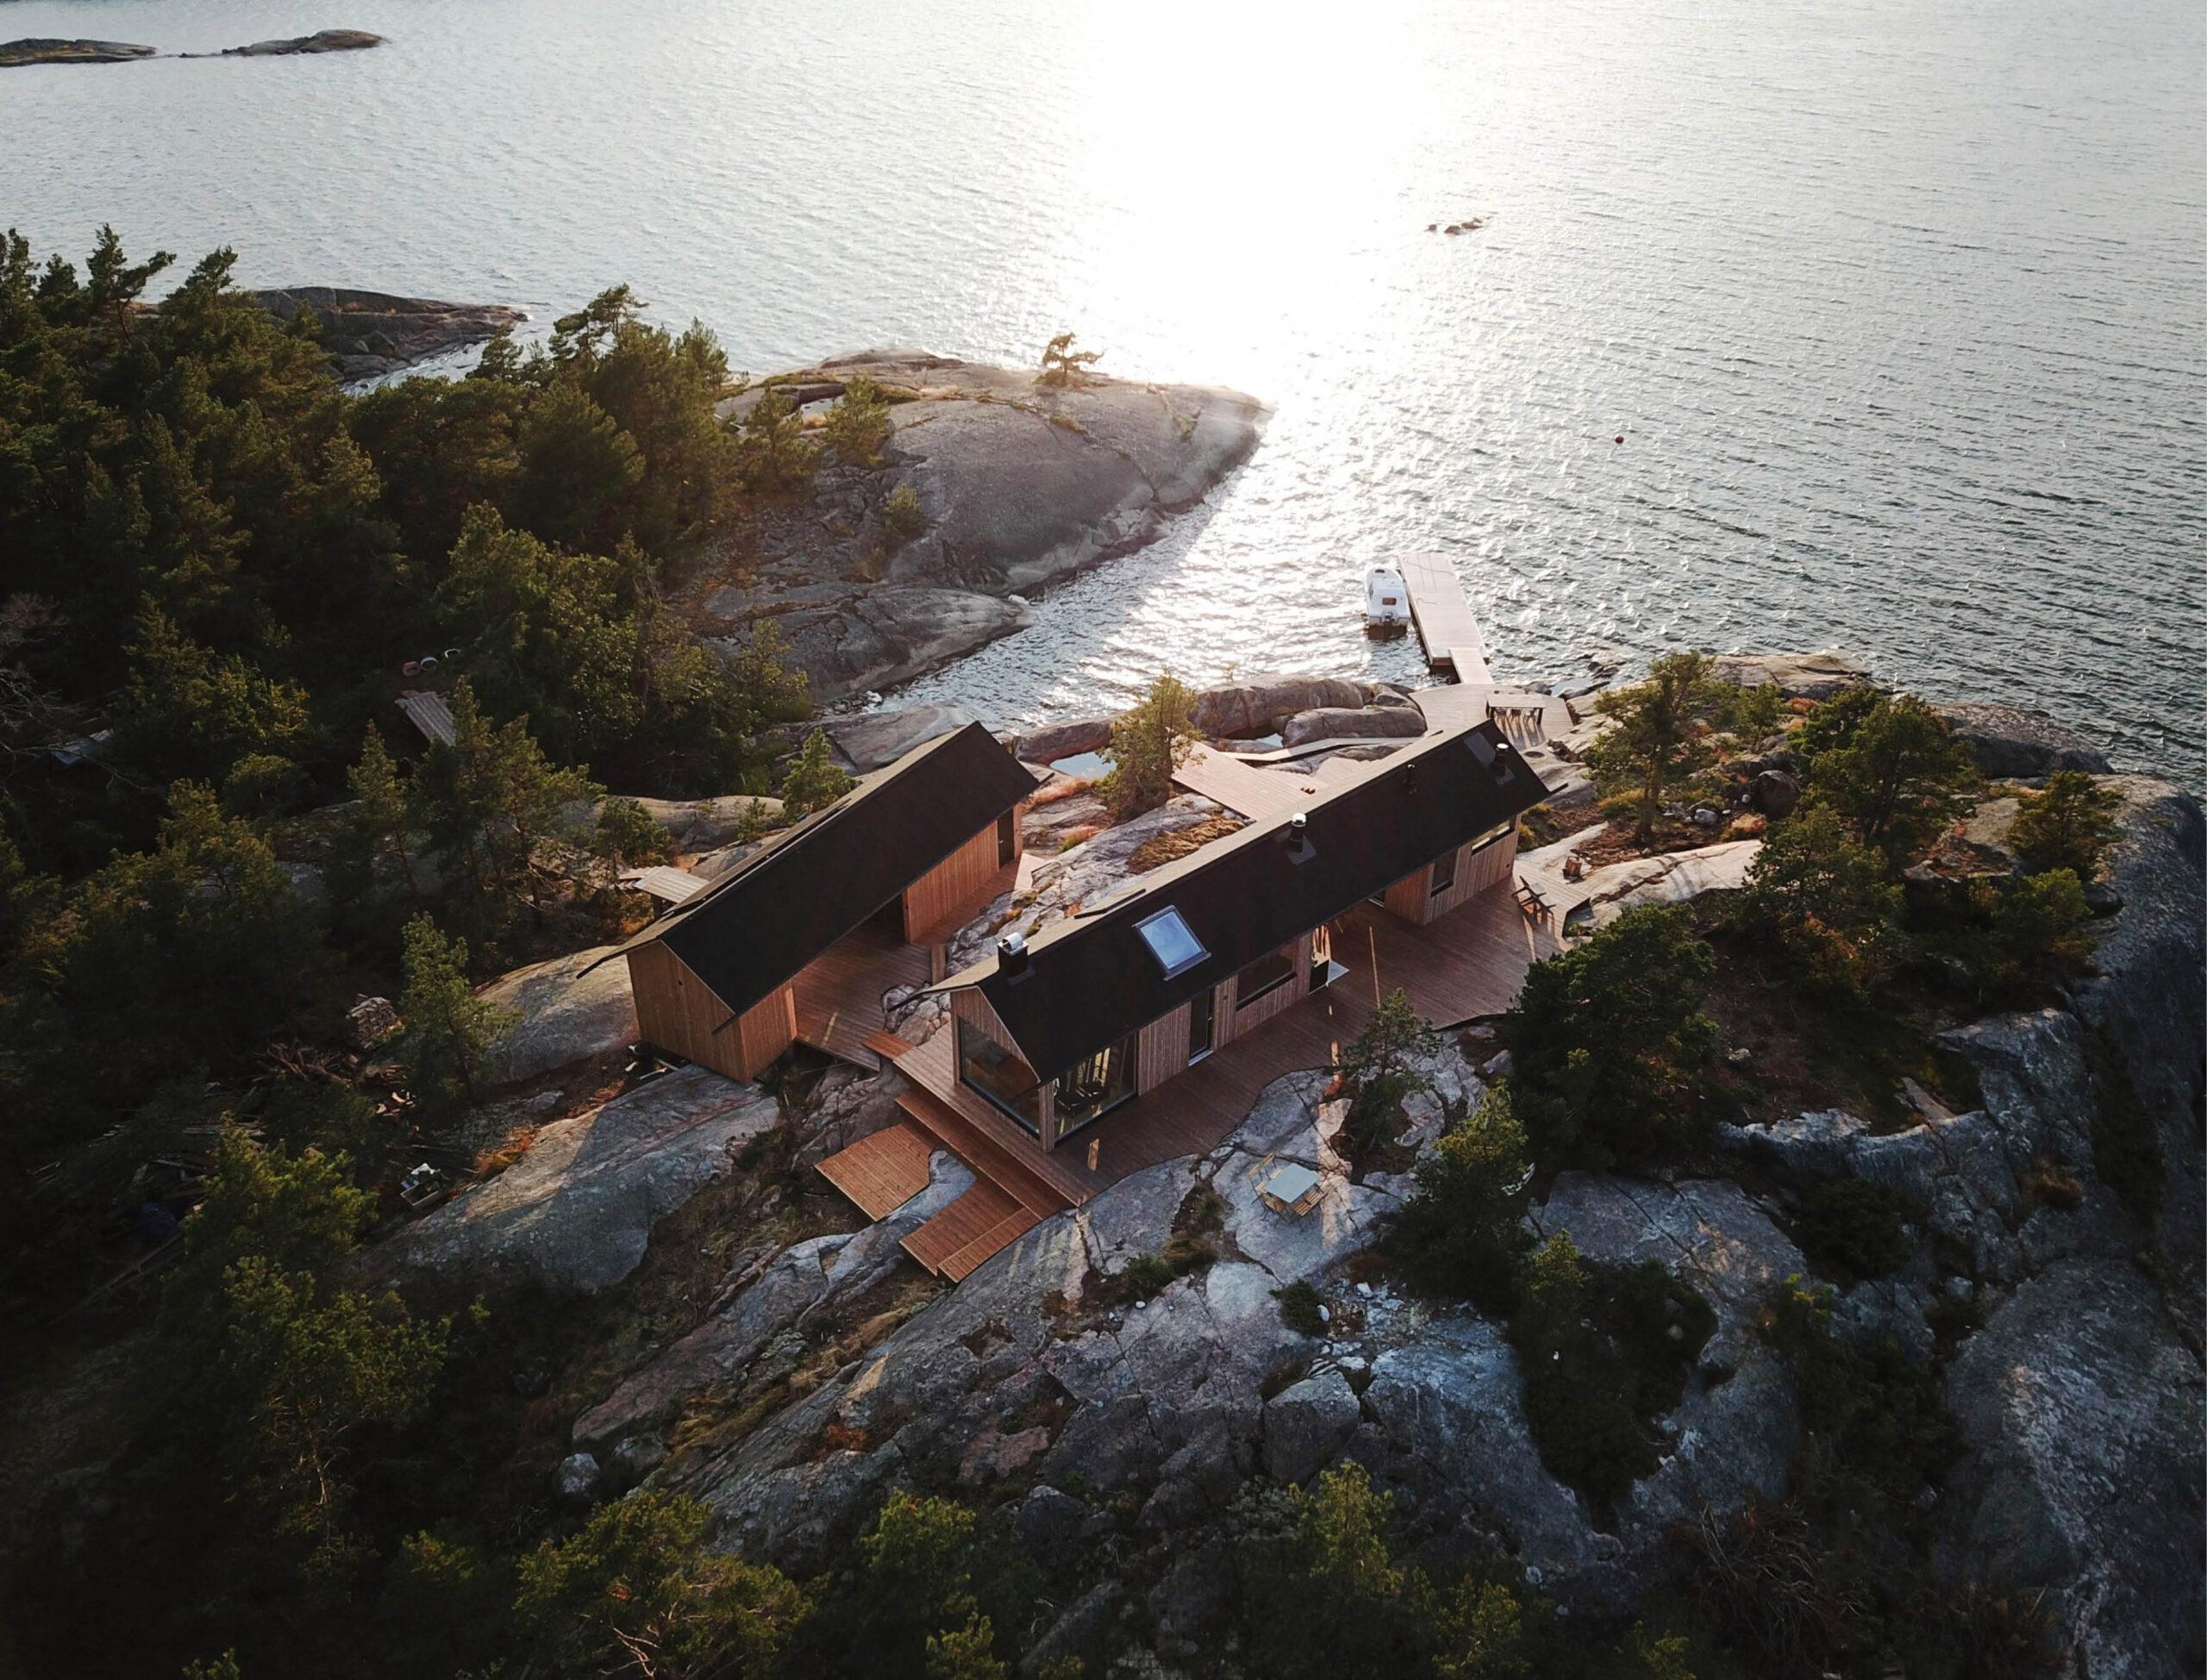 Project Ö Cabin by Aleksi Hautamäki